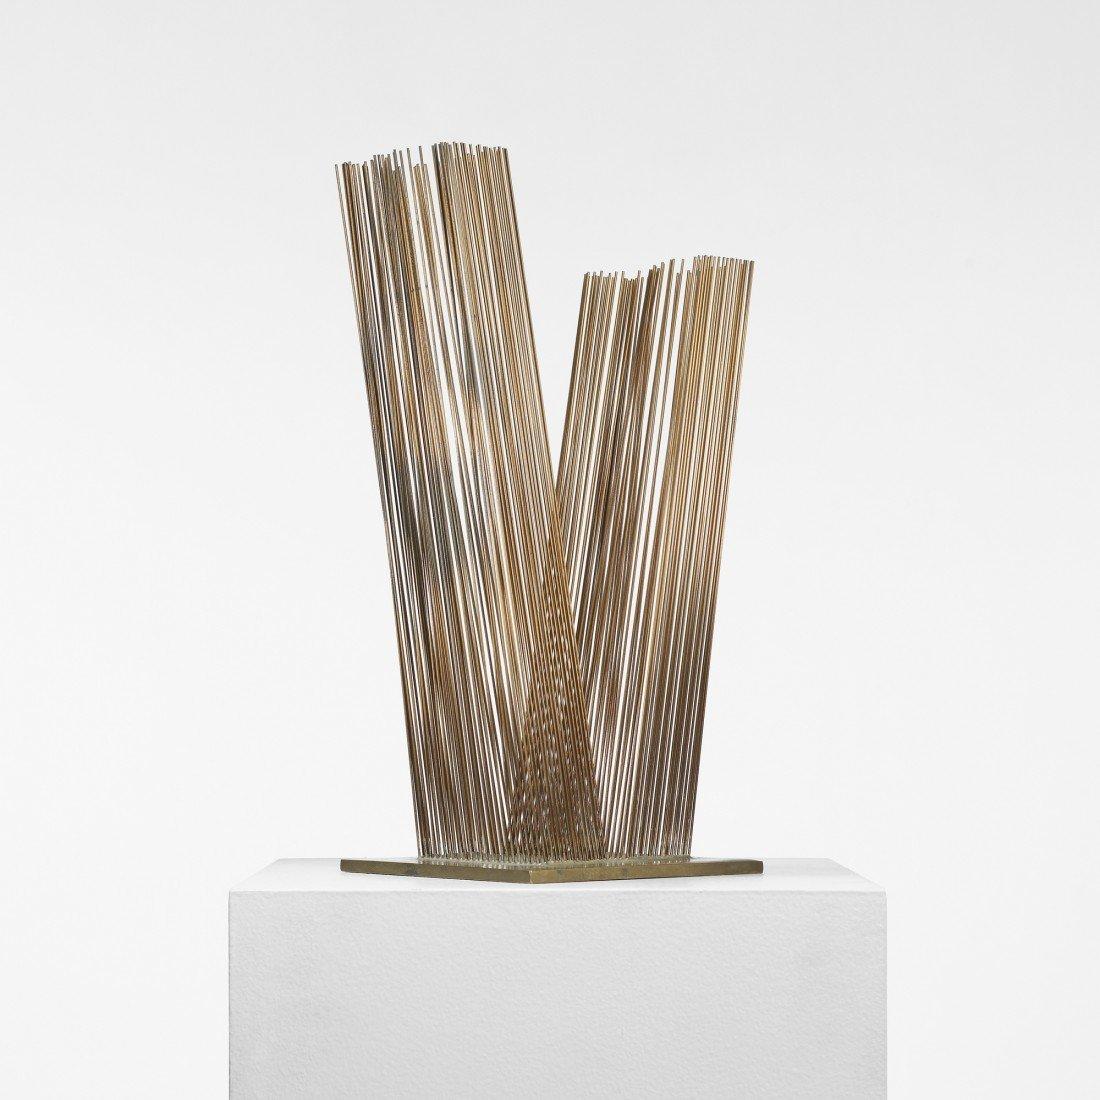 103: Harry Bertoia untitled (Sonambient)